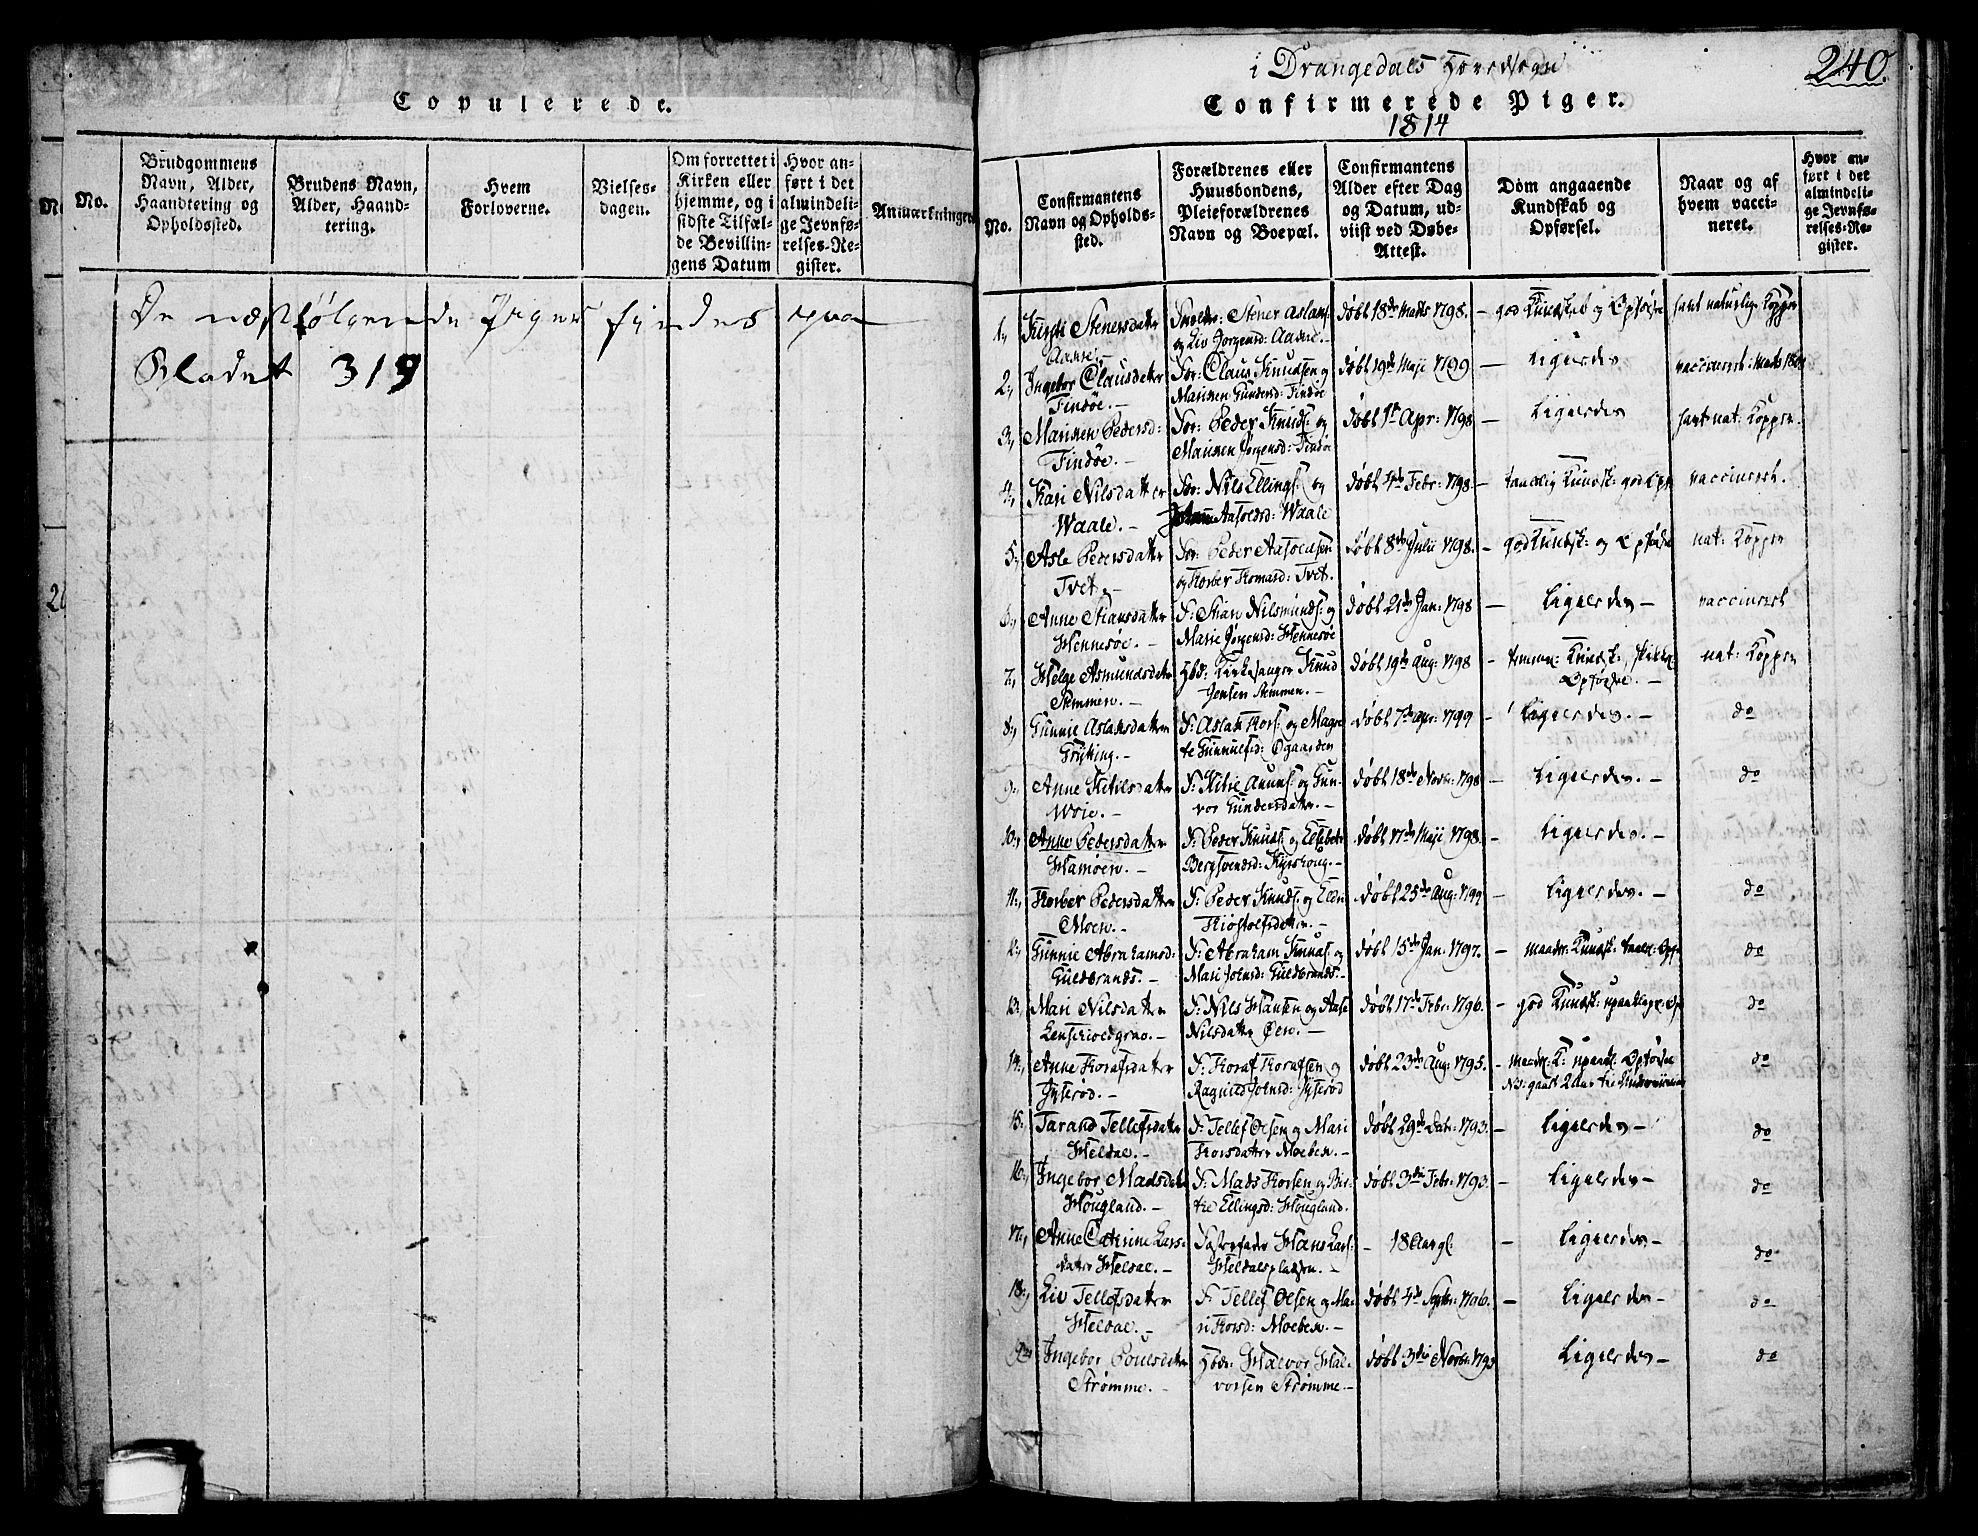 SAKO, Drangedal kirkebøker, F/Fa/L0005: Ministerialbok nr. 5 /1, 1814-1831, s. 240